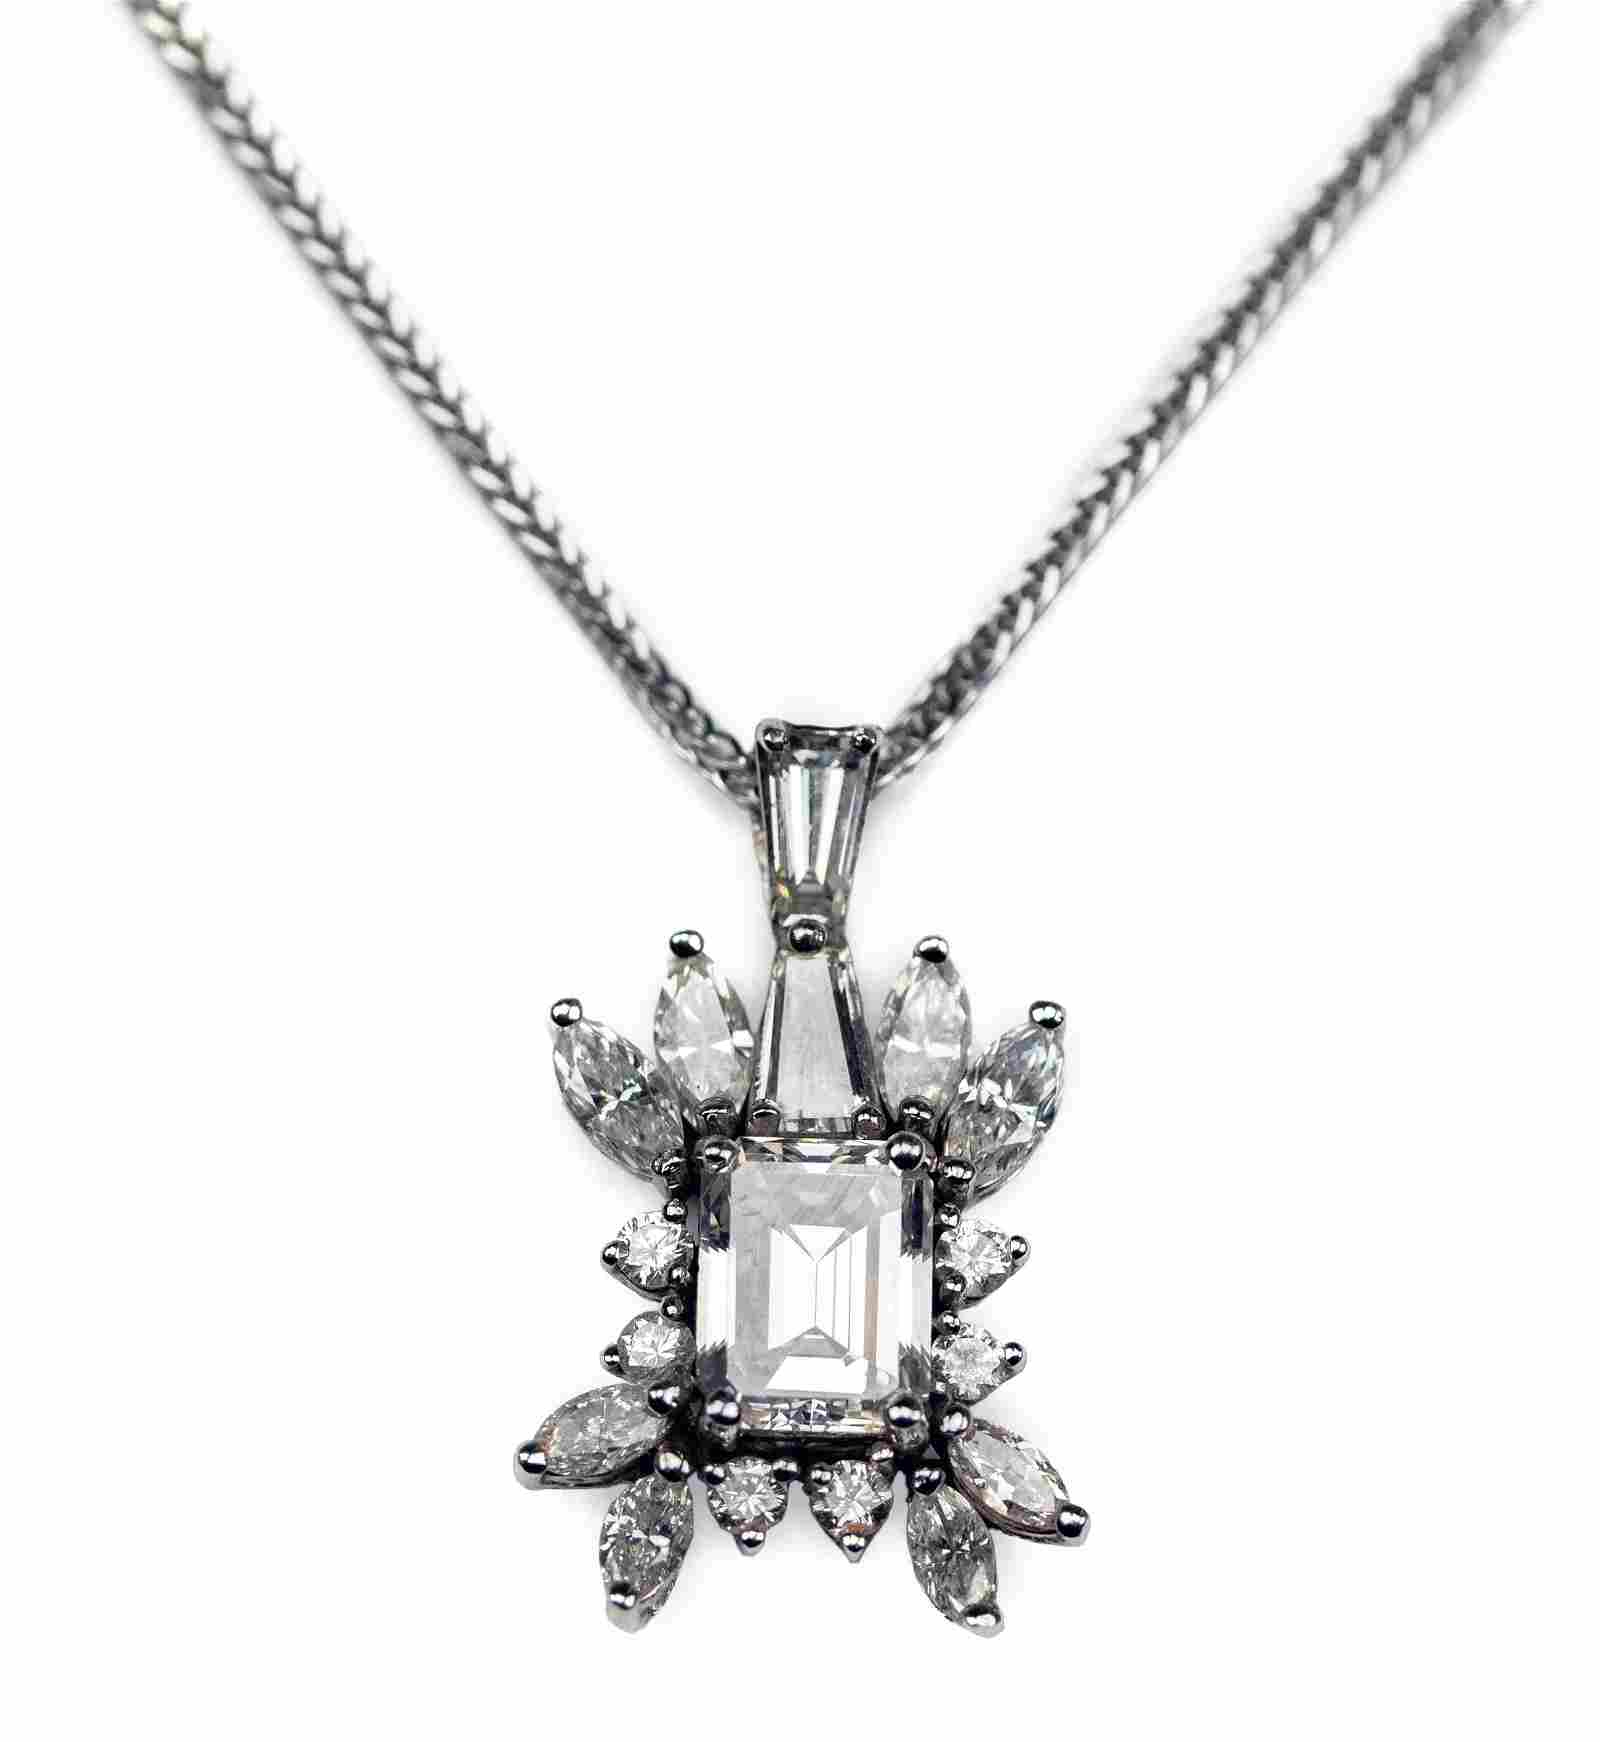 Fine 14k White Gold 3.38 CTTW Diamond Pendant